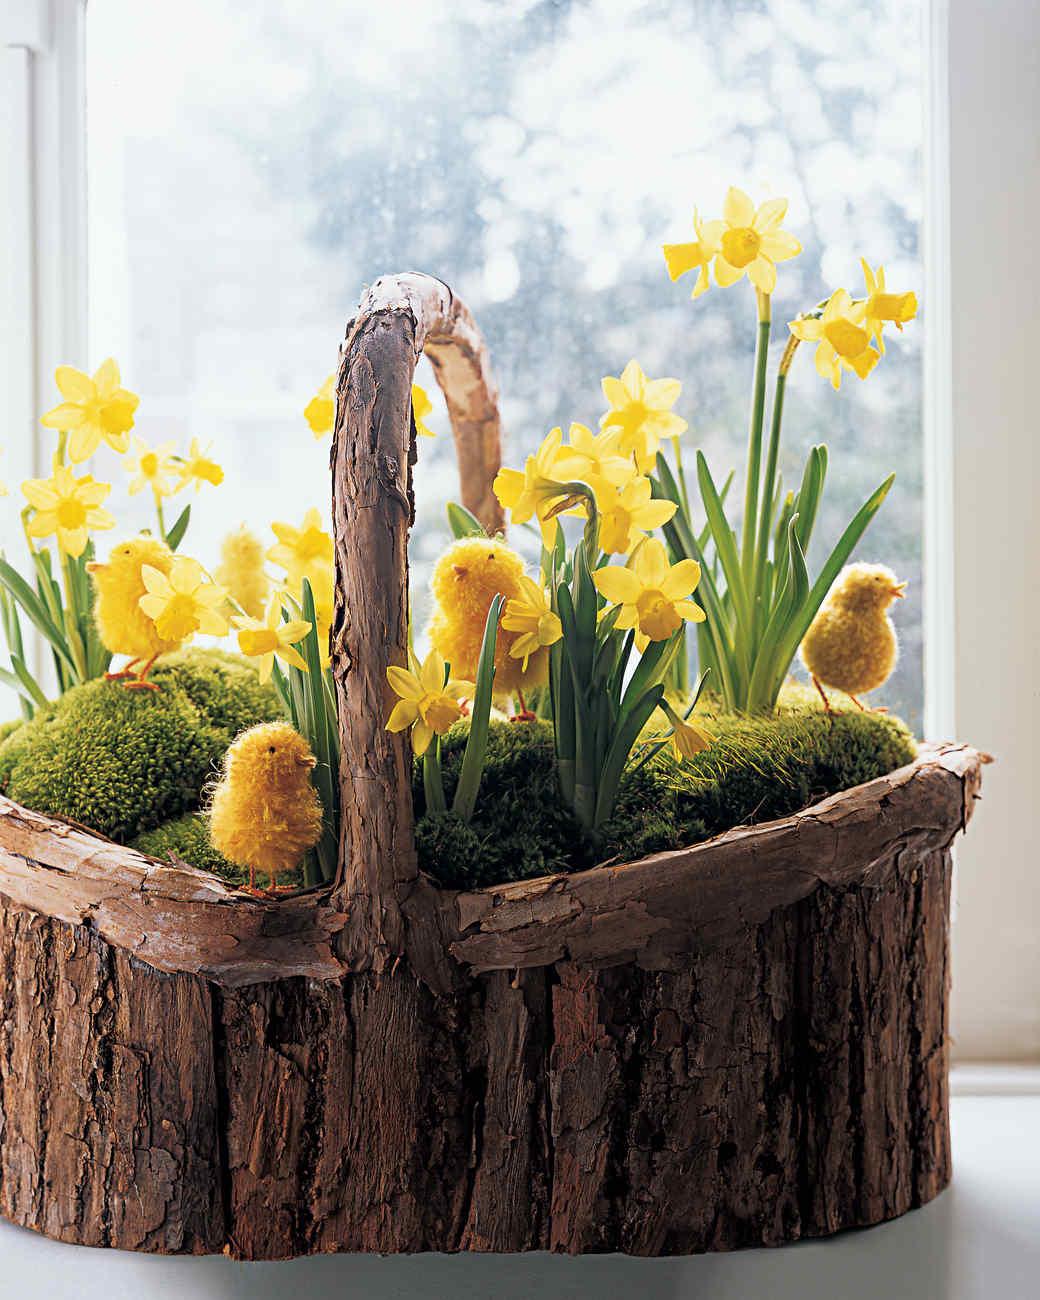 Martha stewart decoracion interesting ek succes martha - Martha stewart decoracion ...